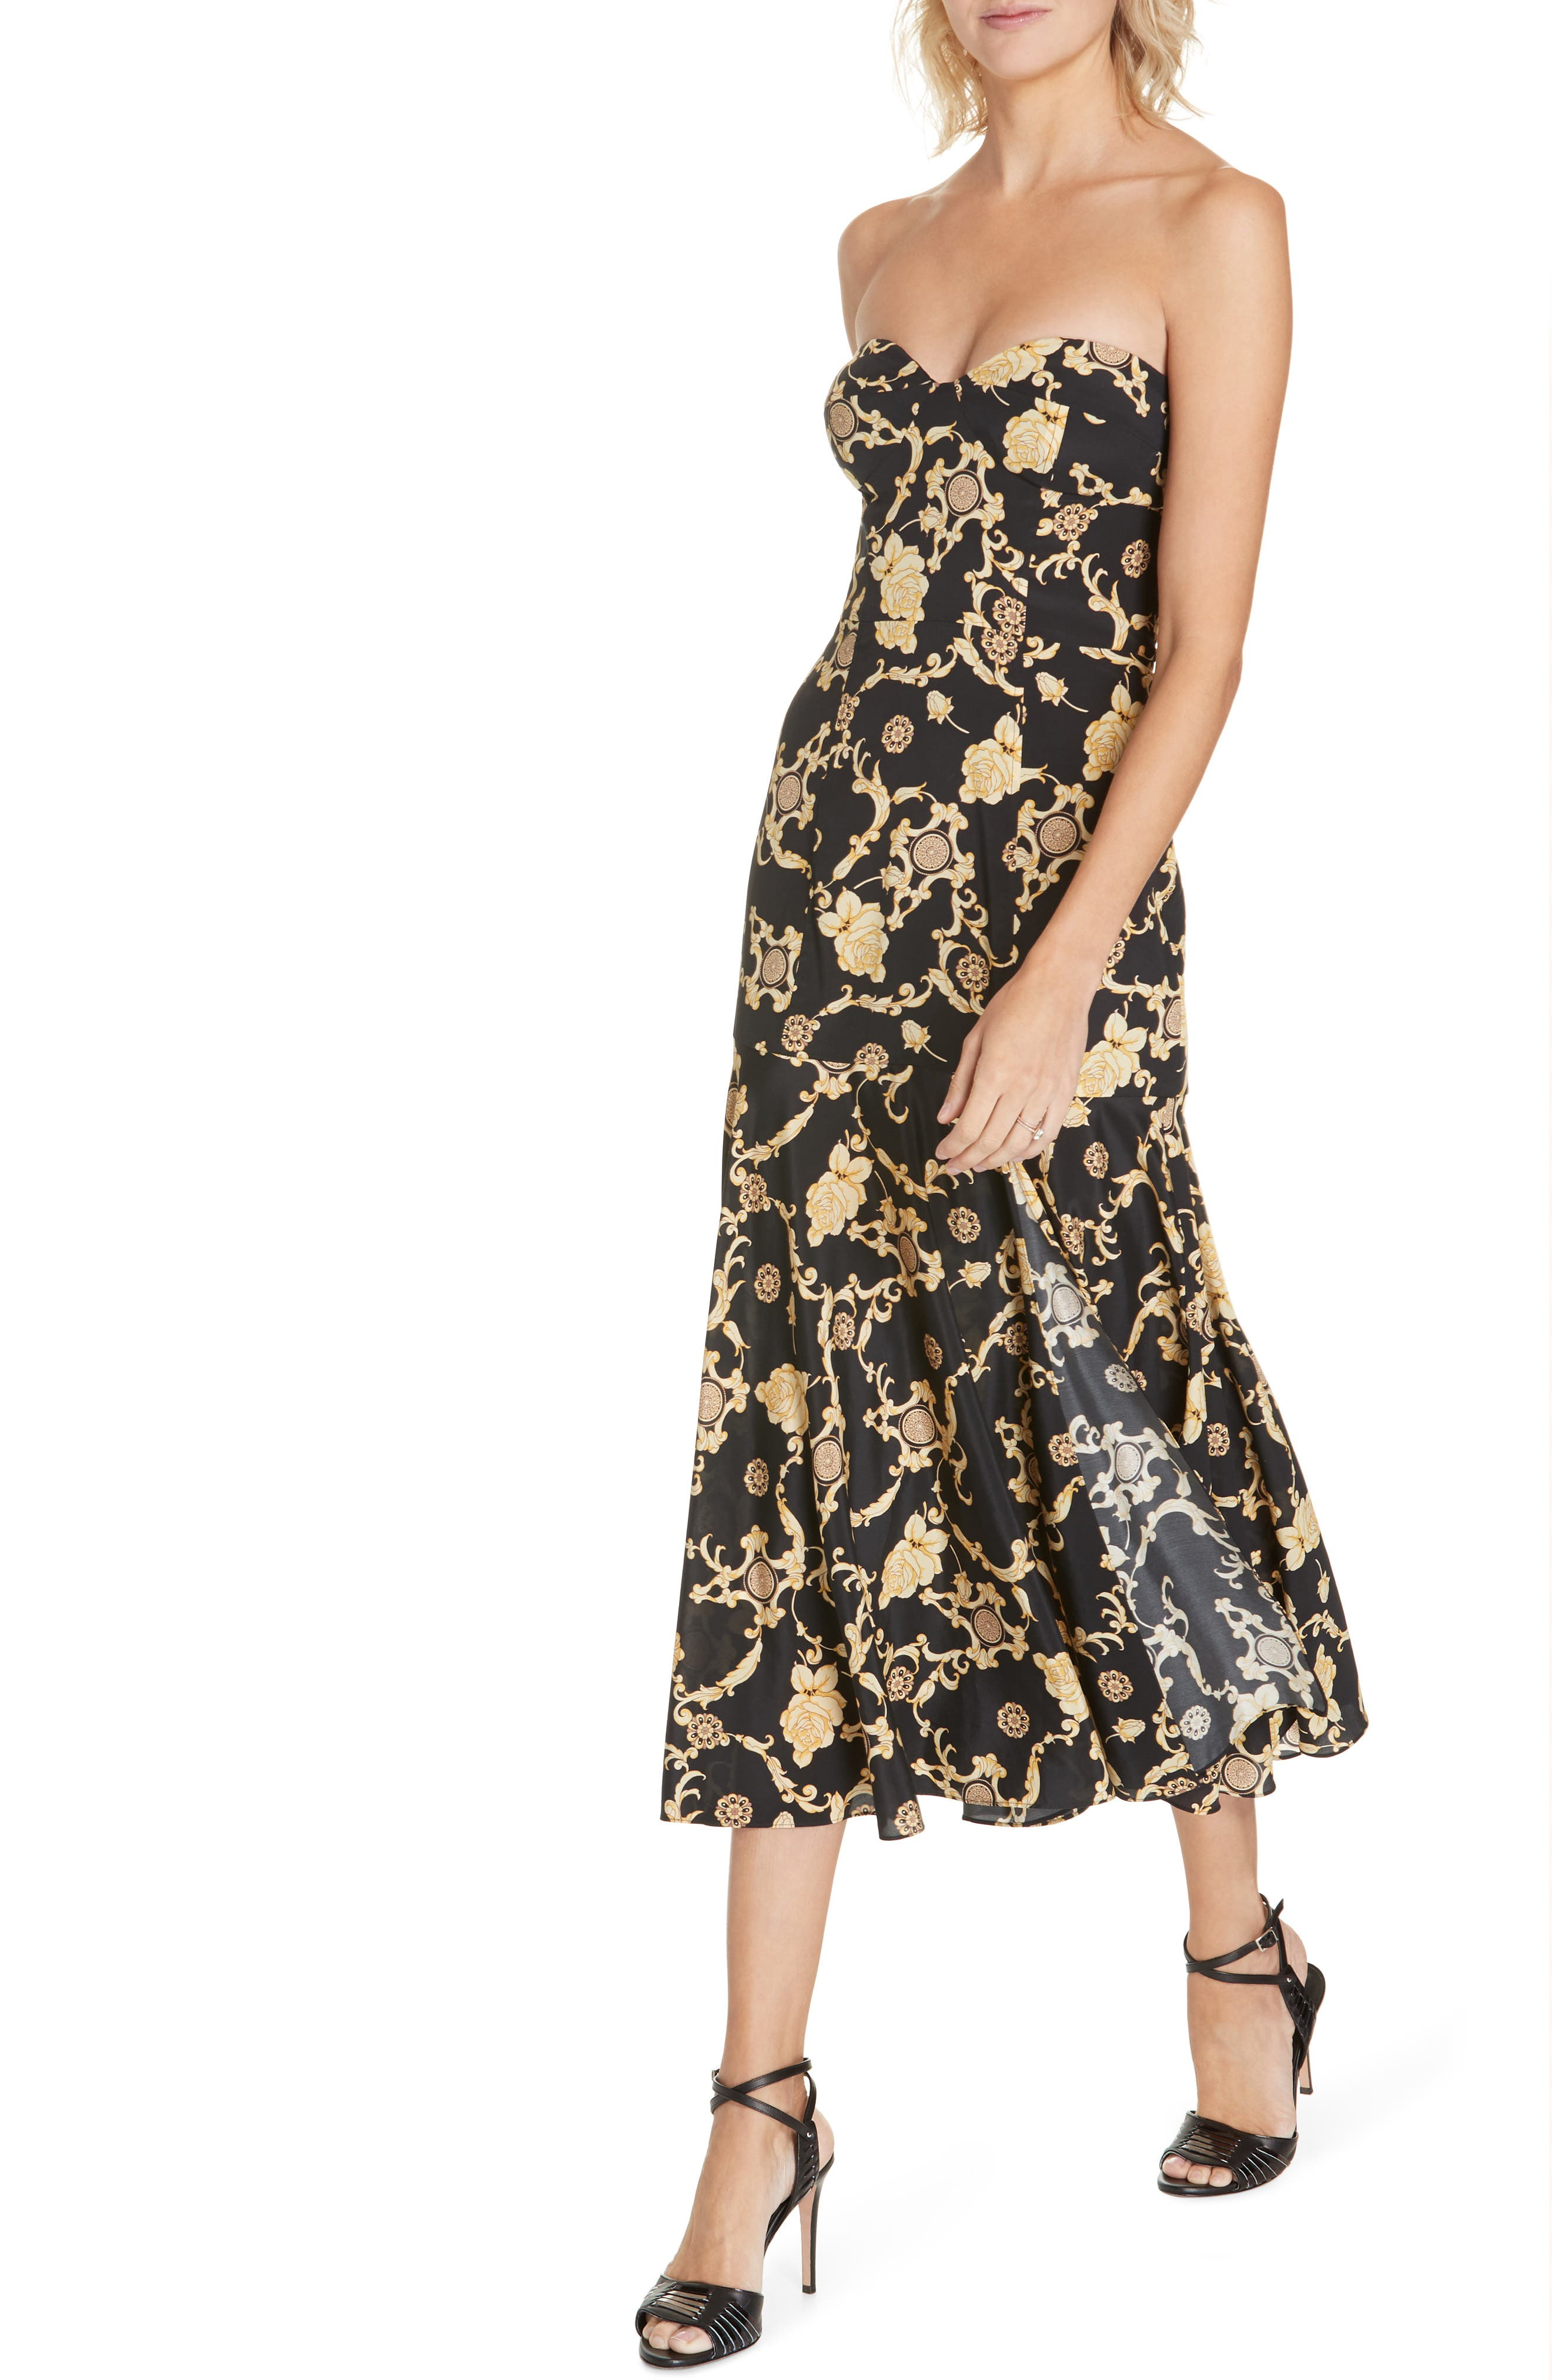 Annika Floral Print Strapless Stretch Silk Dress,                             Alternate thumbnail 4, color,                             BLACK/ GOLD